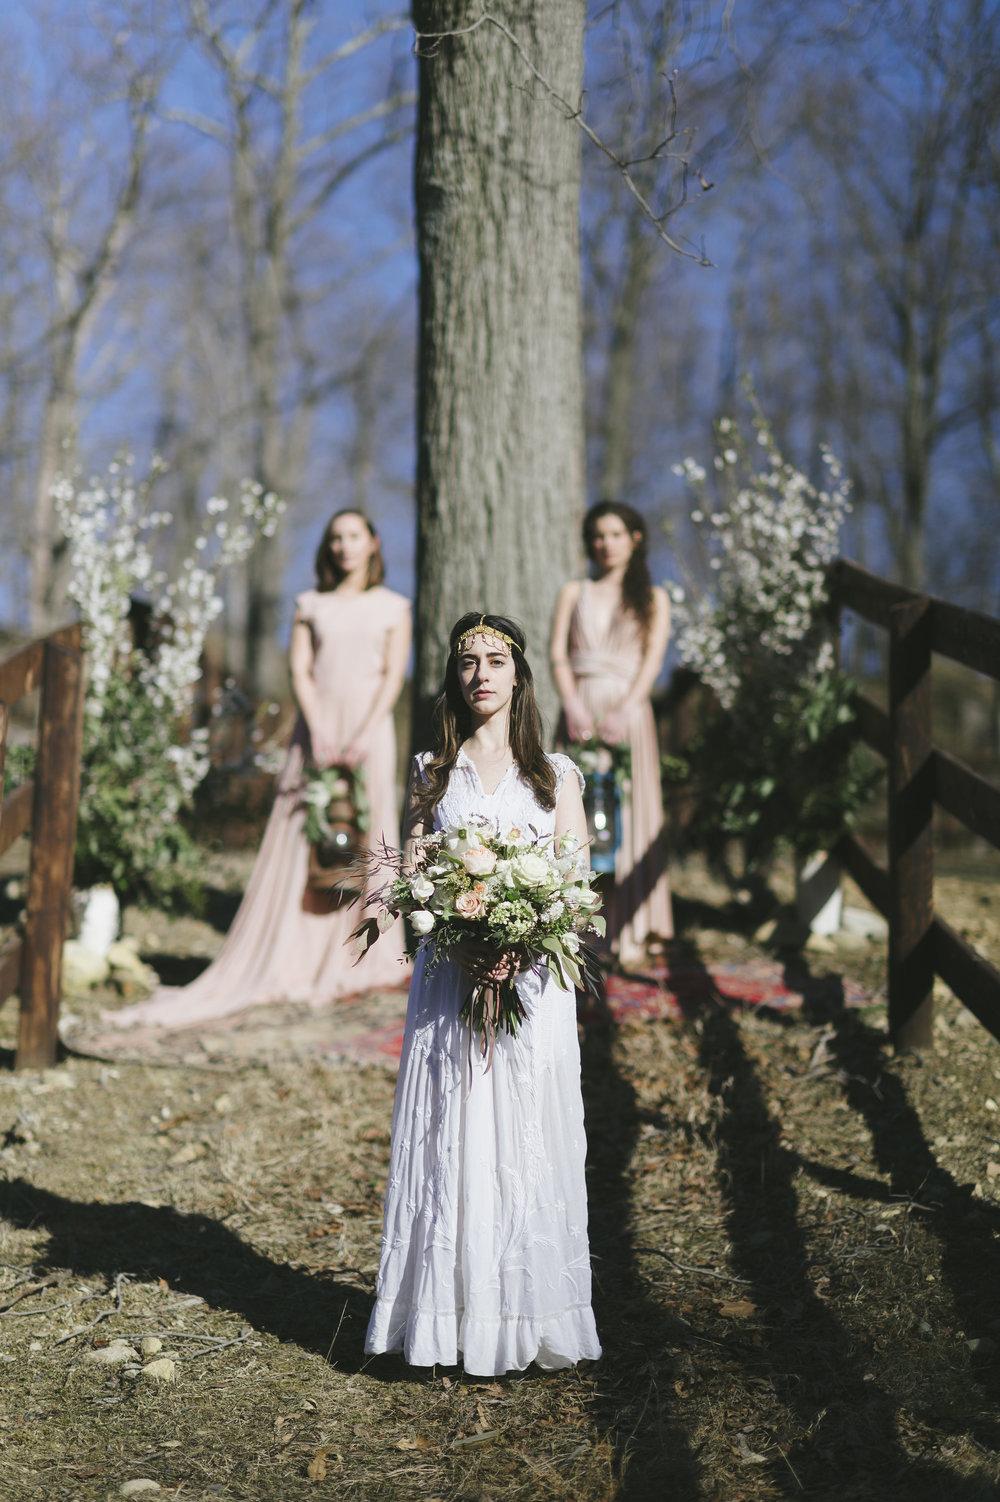 Alicia King Photography